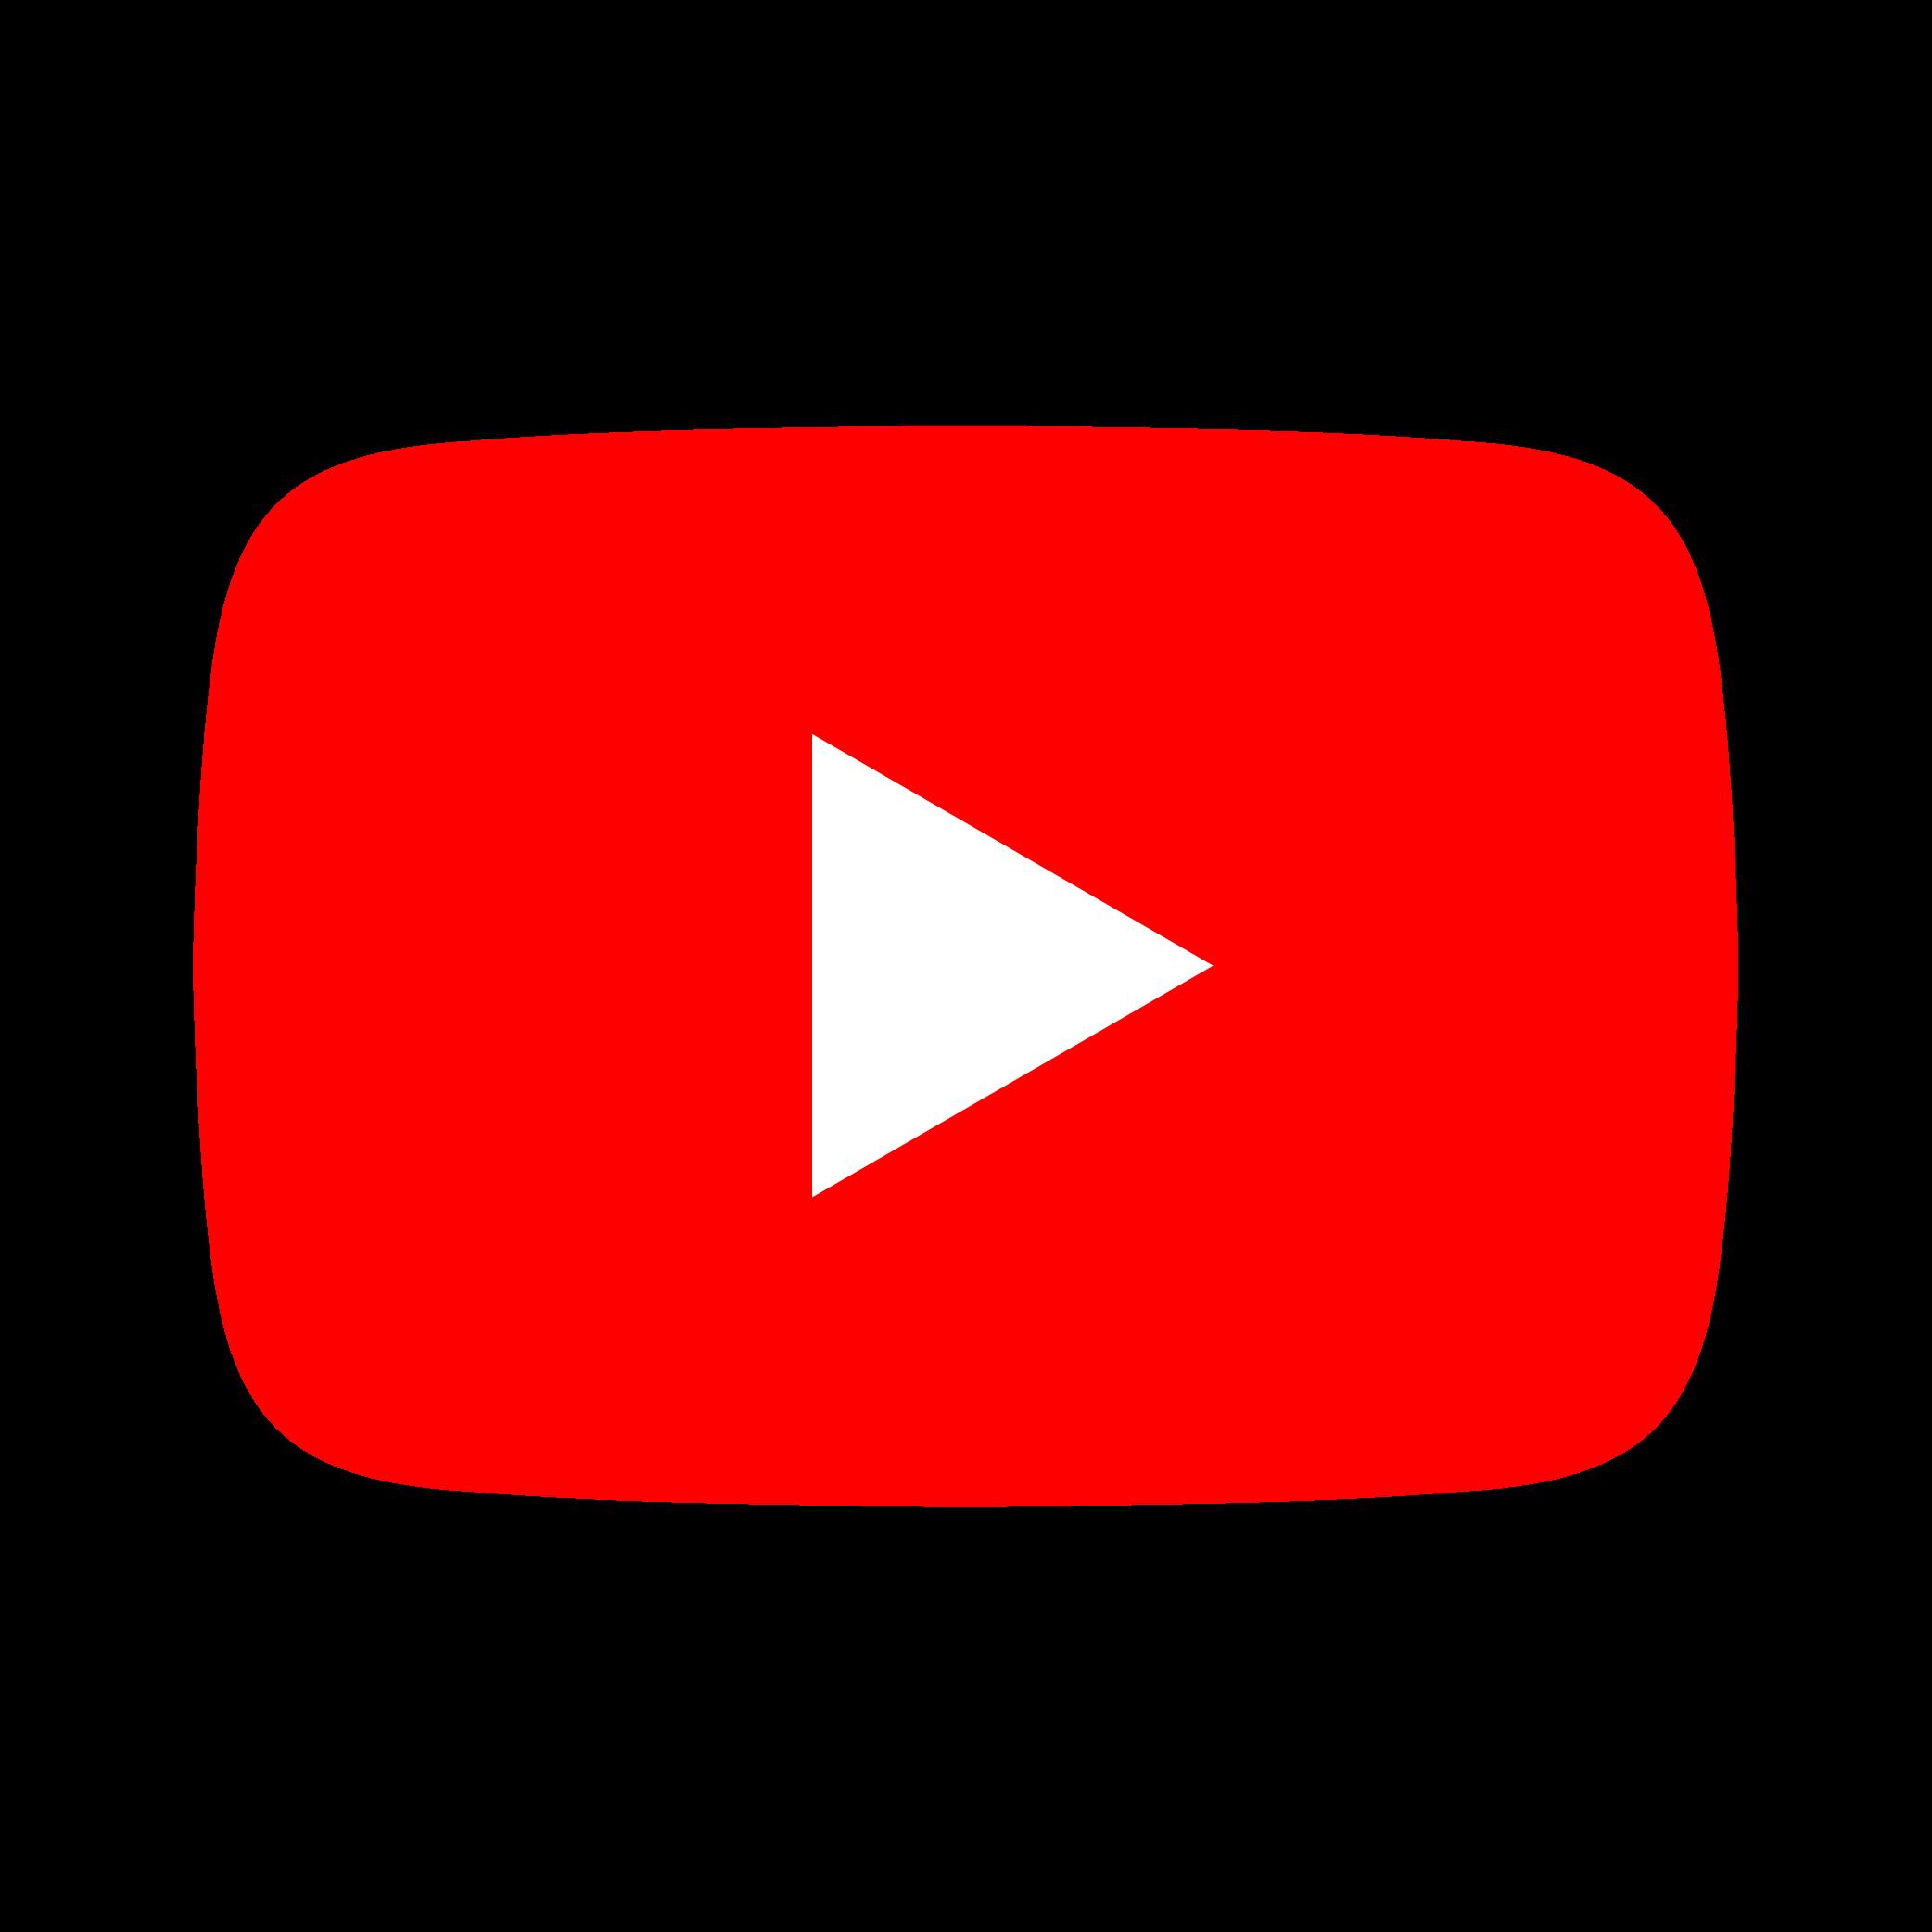 Watch me on YouTube?